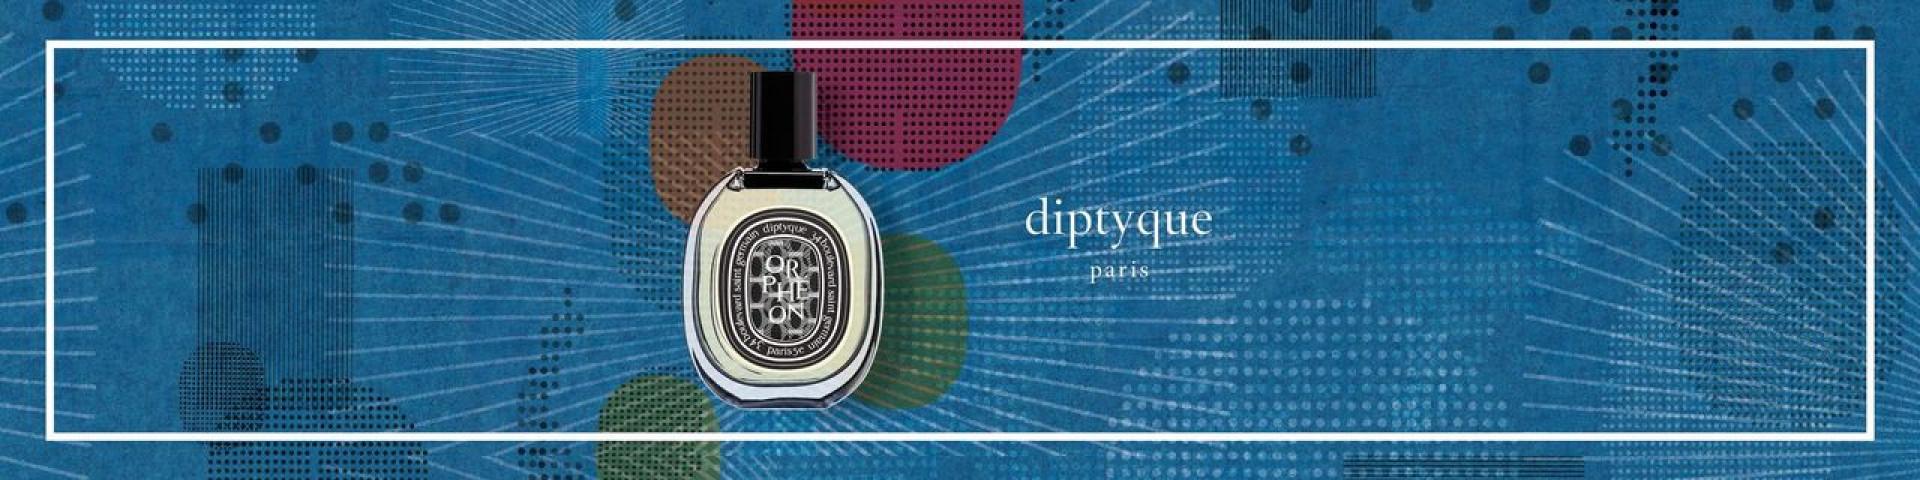 Diptyque Orpheon